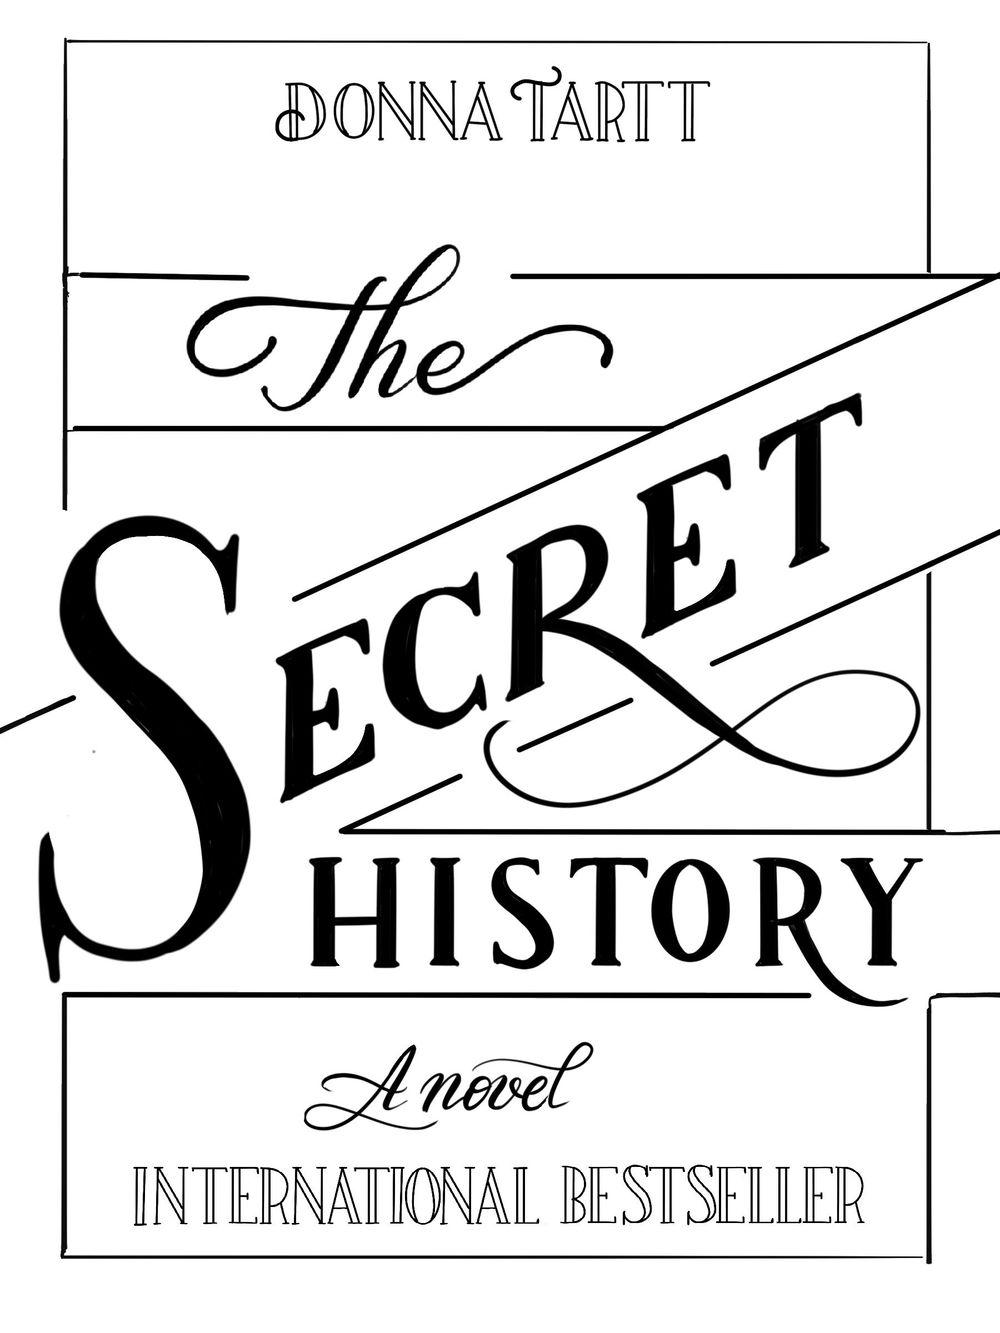 Donna Tartt - The secret history - image 5 - student project